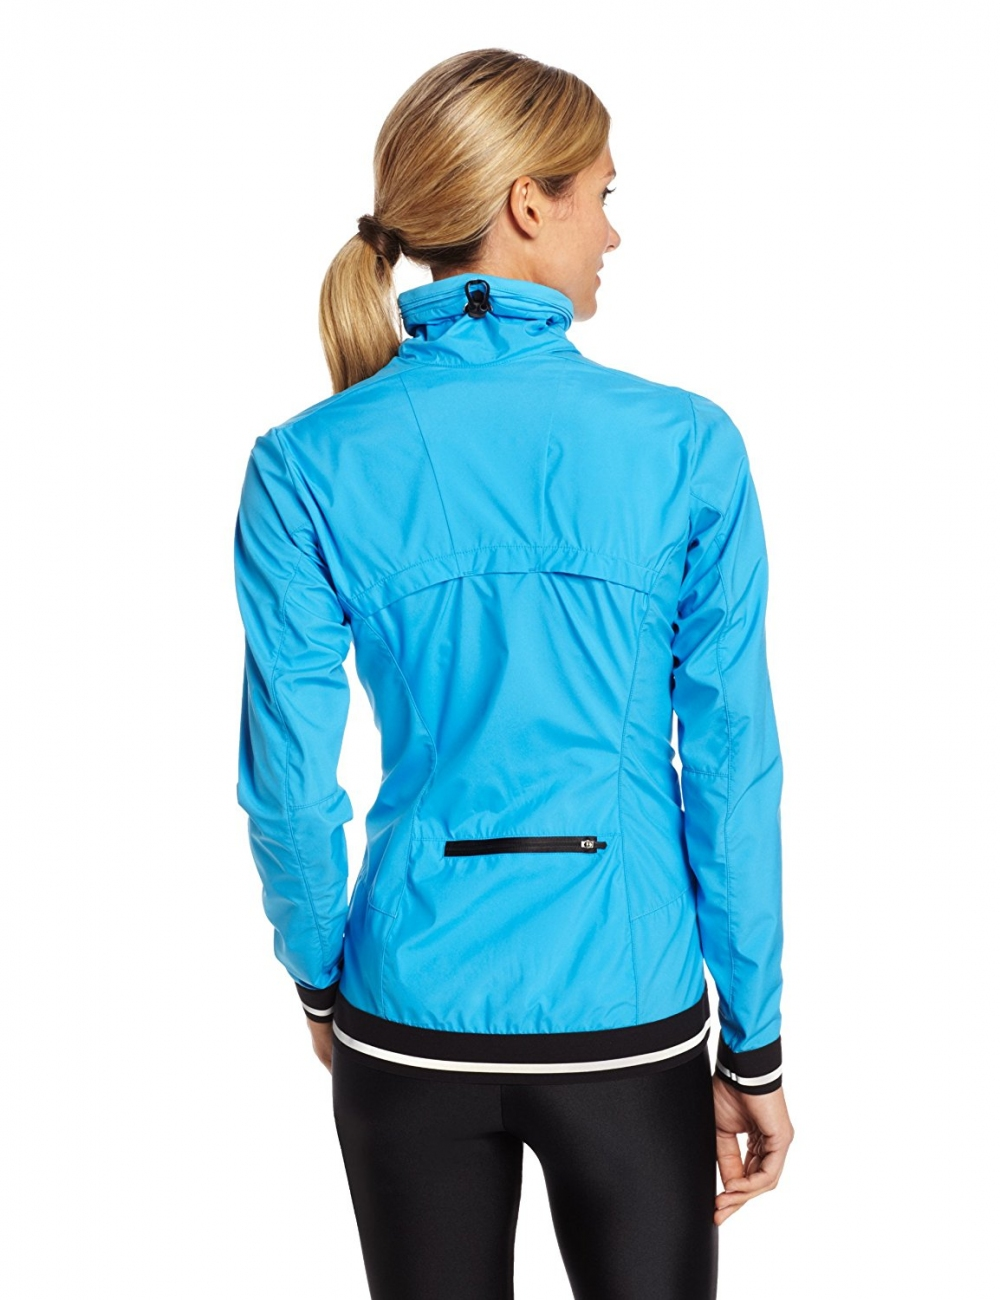 Куртка GORE Running Wear Air 2.0 Windstopper Active Shell Jacket (размер XL(реально L/M)) - 3